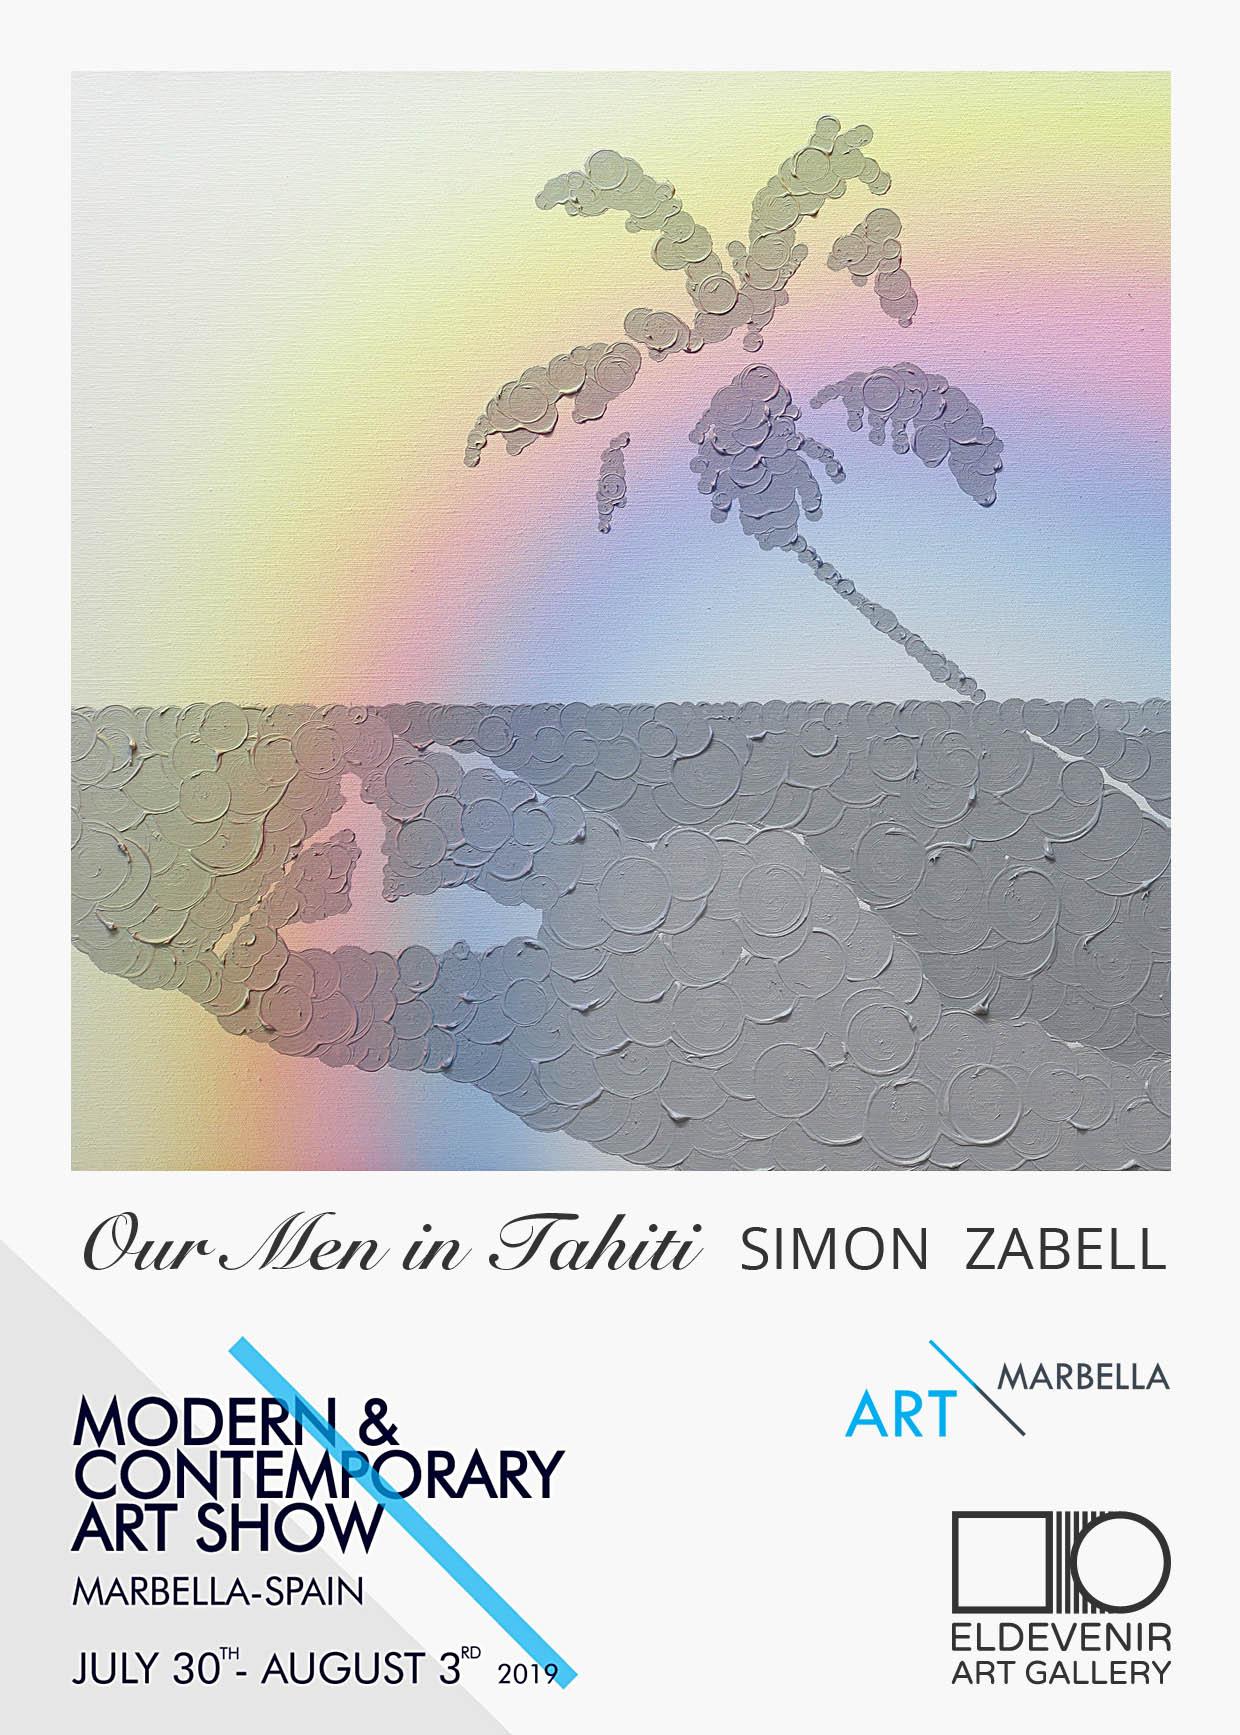 Simon Zabell, ARTMARBELLA - 30 julio - 3 agosto 2019Booth J 14Modern & Contemporary Art ShowPalacio de Congresos y Exposiciones de MarbellaMarbella, Málaga, España.